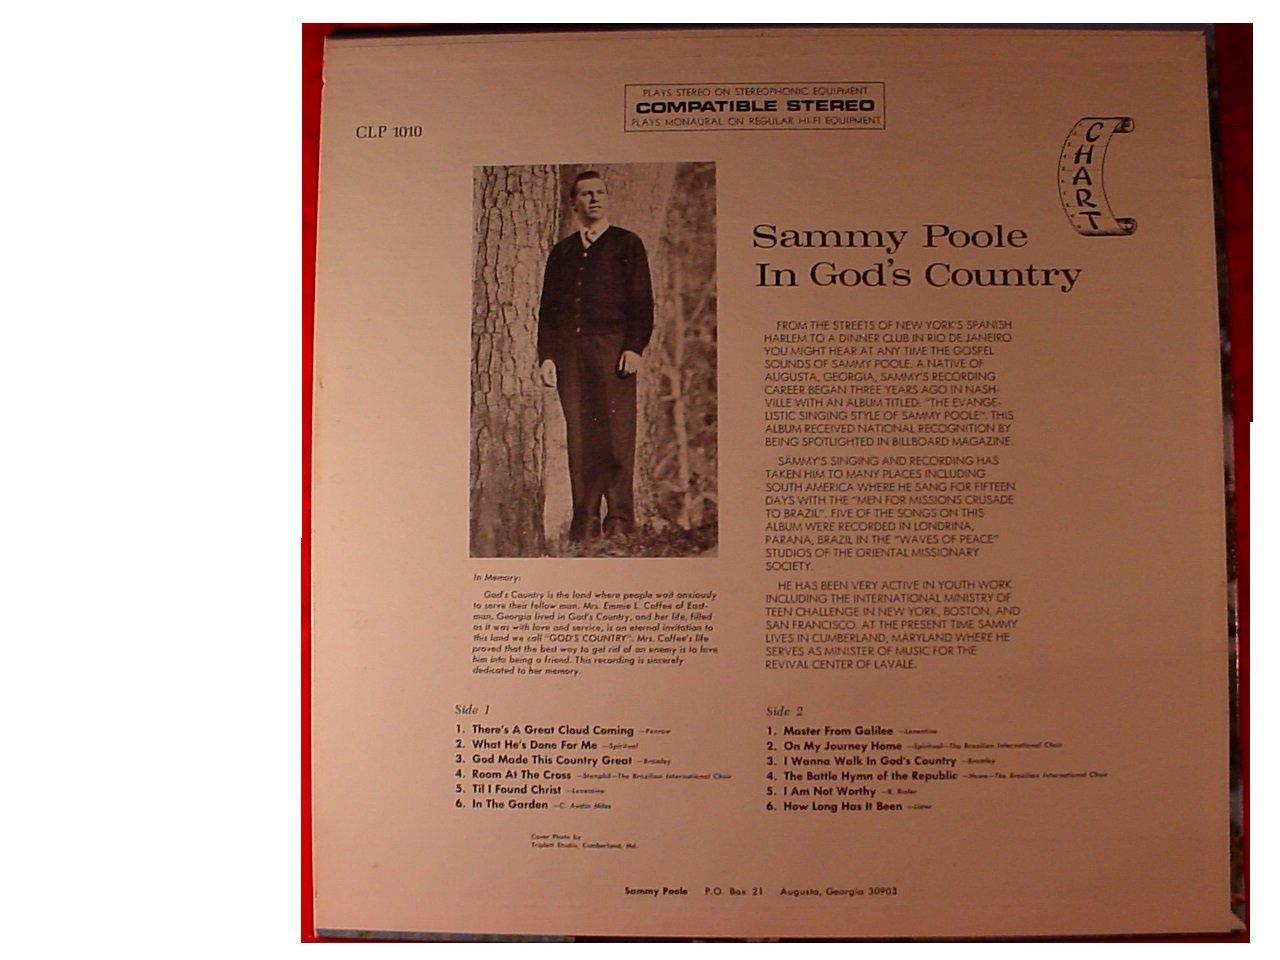 SAMMY POOLE - Sammy Poole in God\'s Country Vinyl Lp - Amazon.com Music